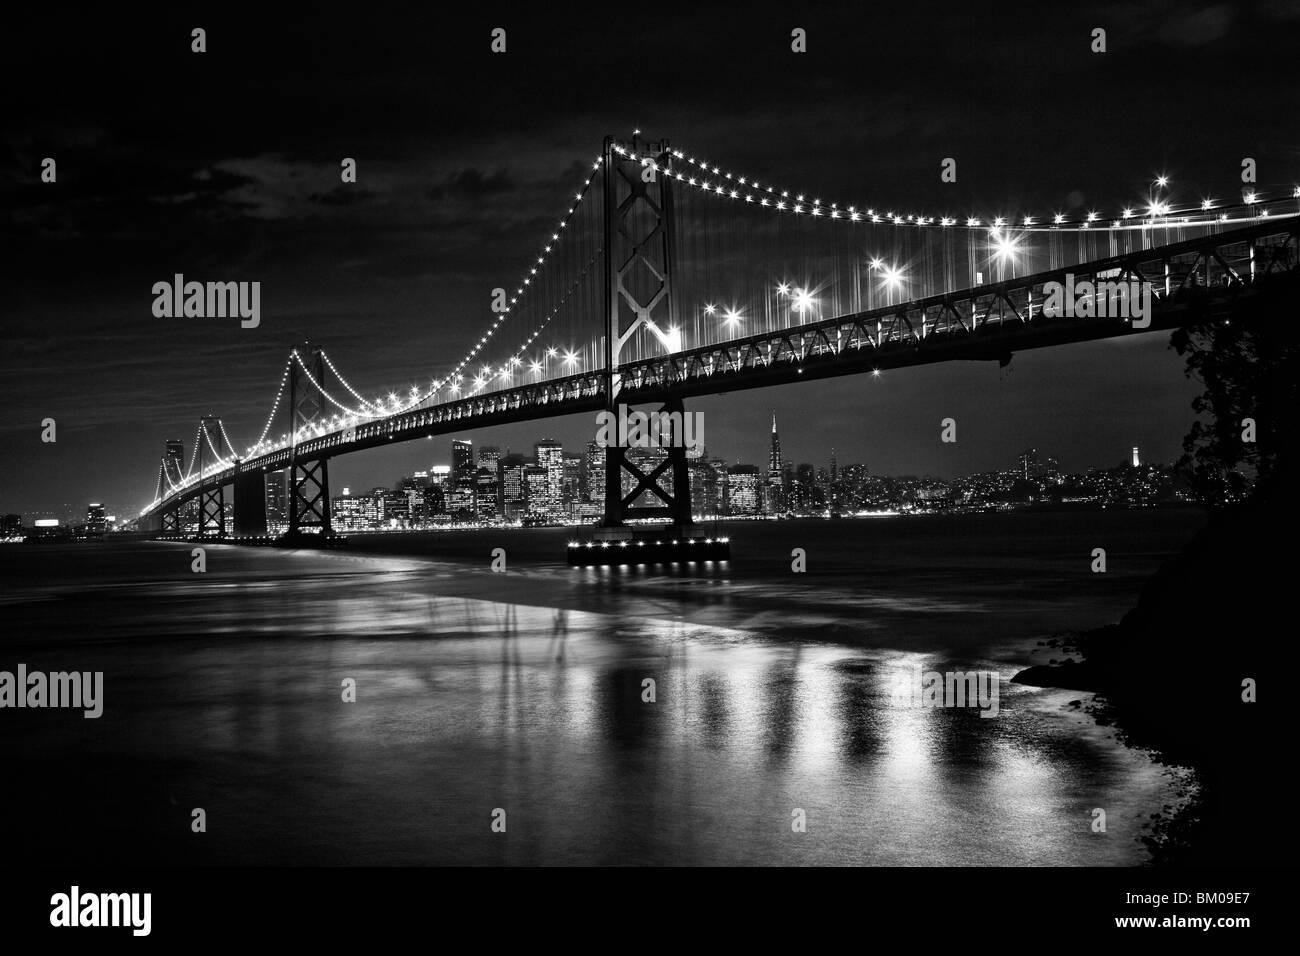 View of San Francisco and the Oakland Bay Bridge at night Stock Photo